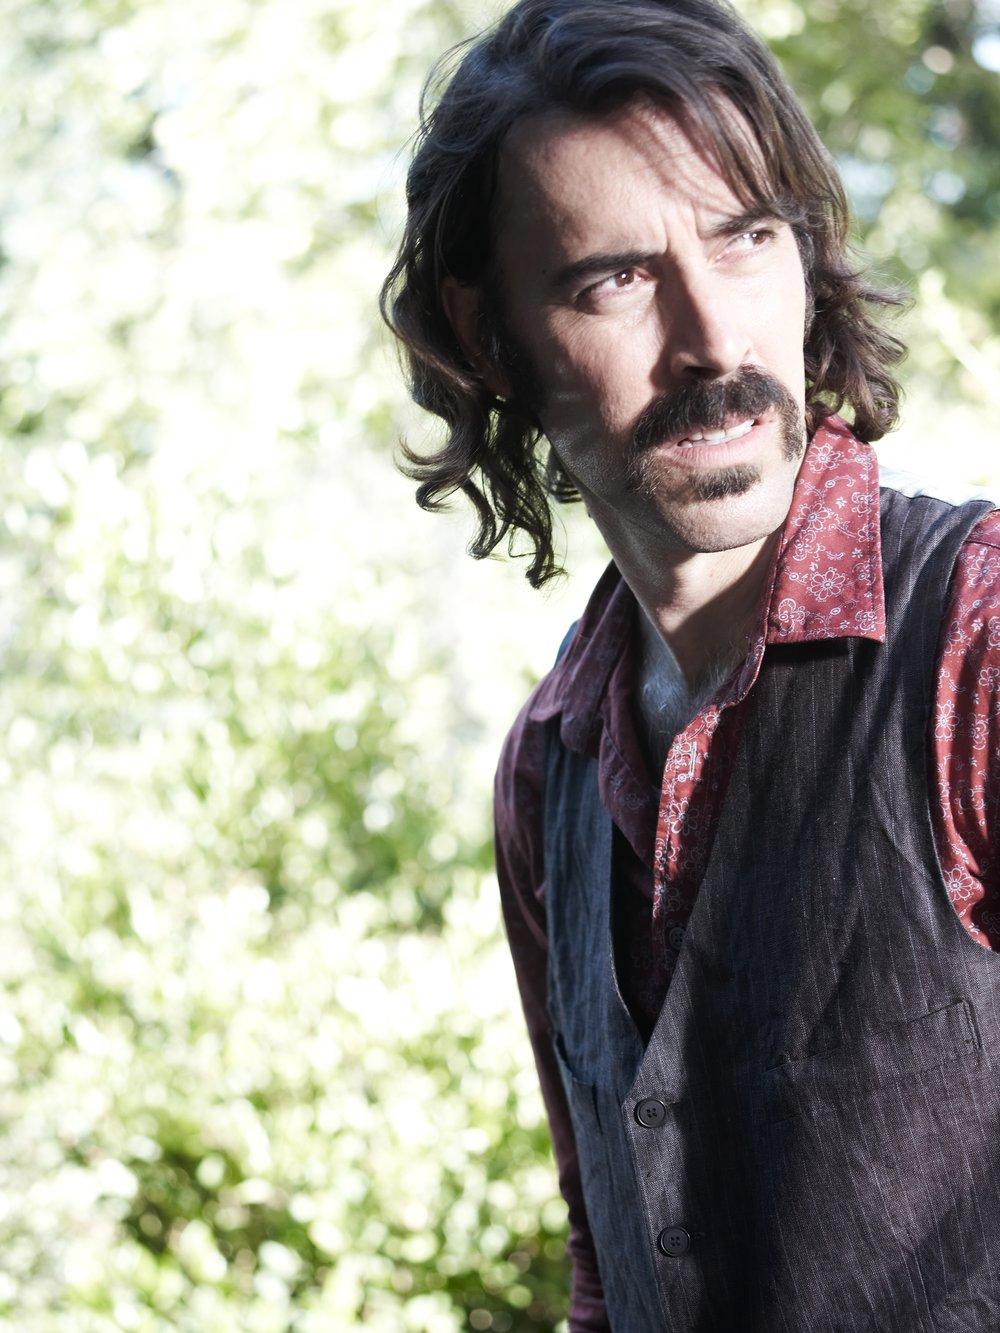 zappa headshot.jpg